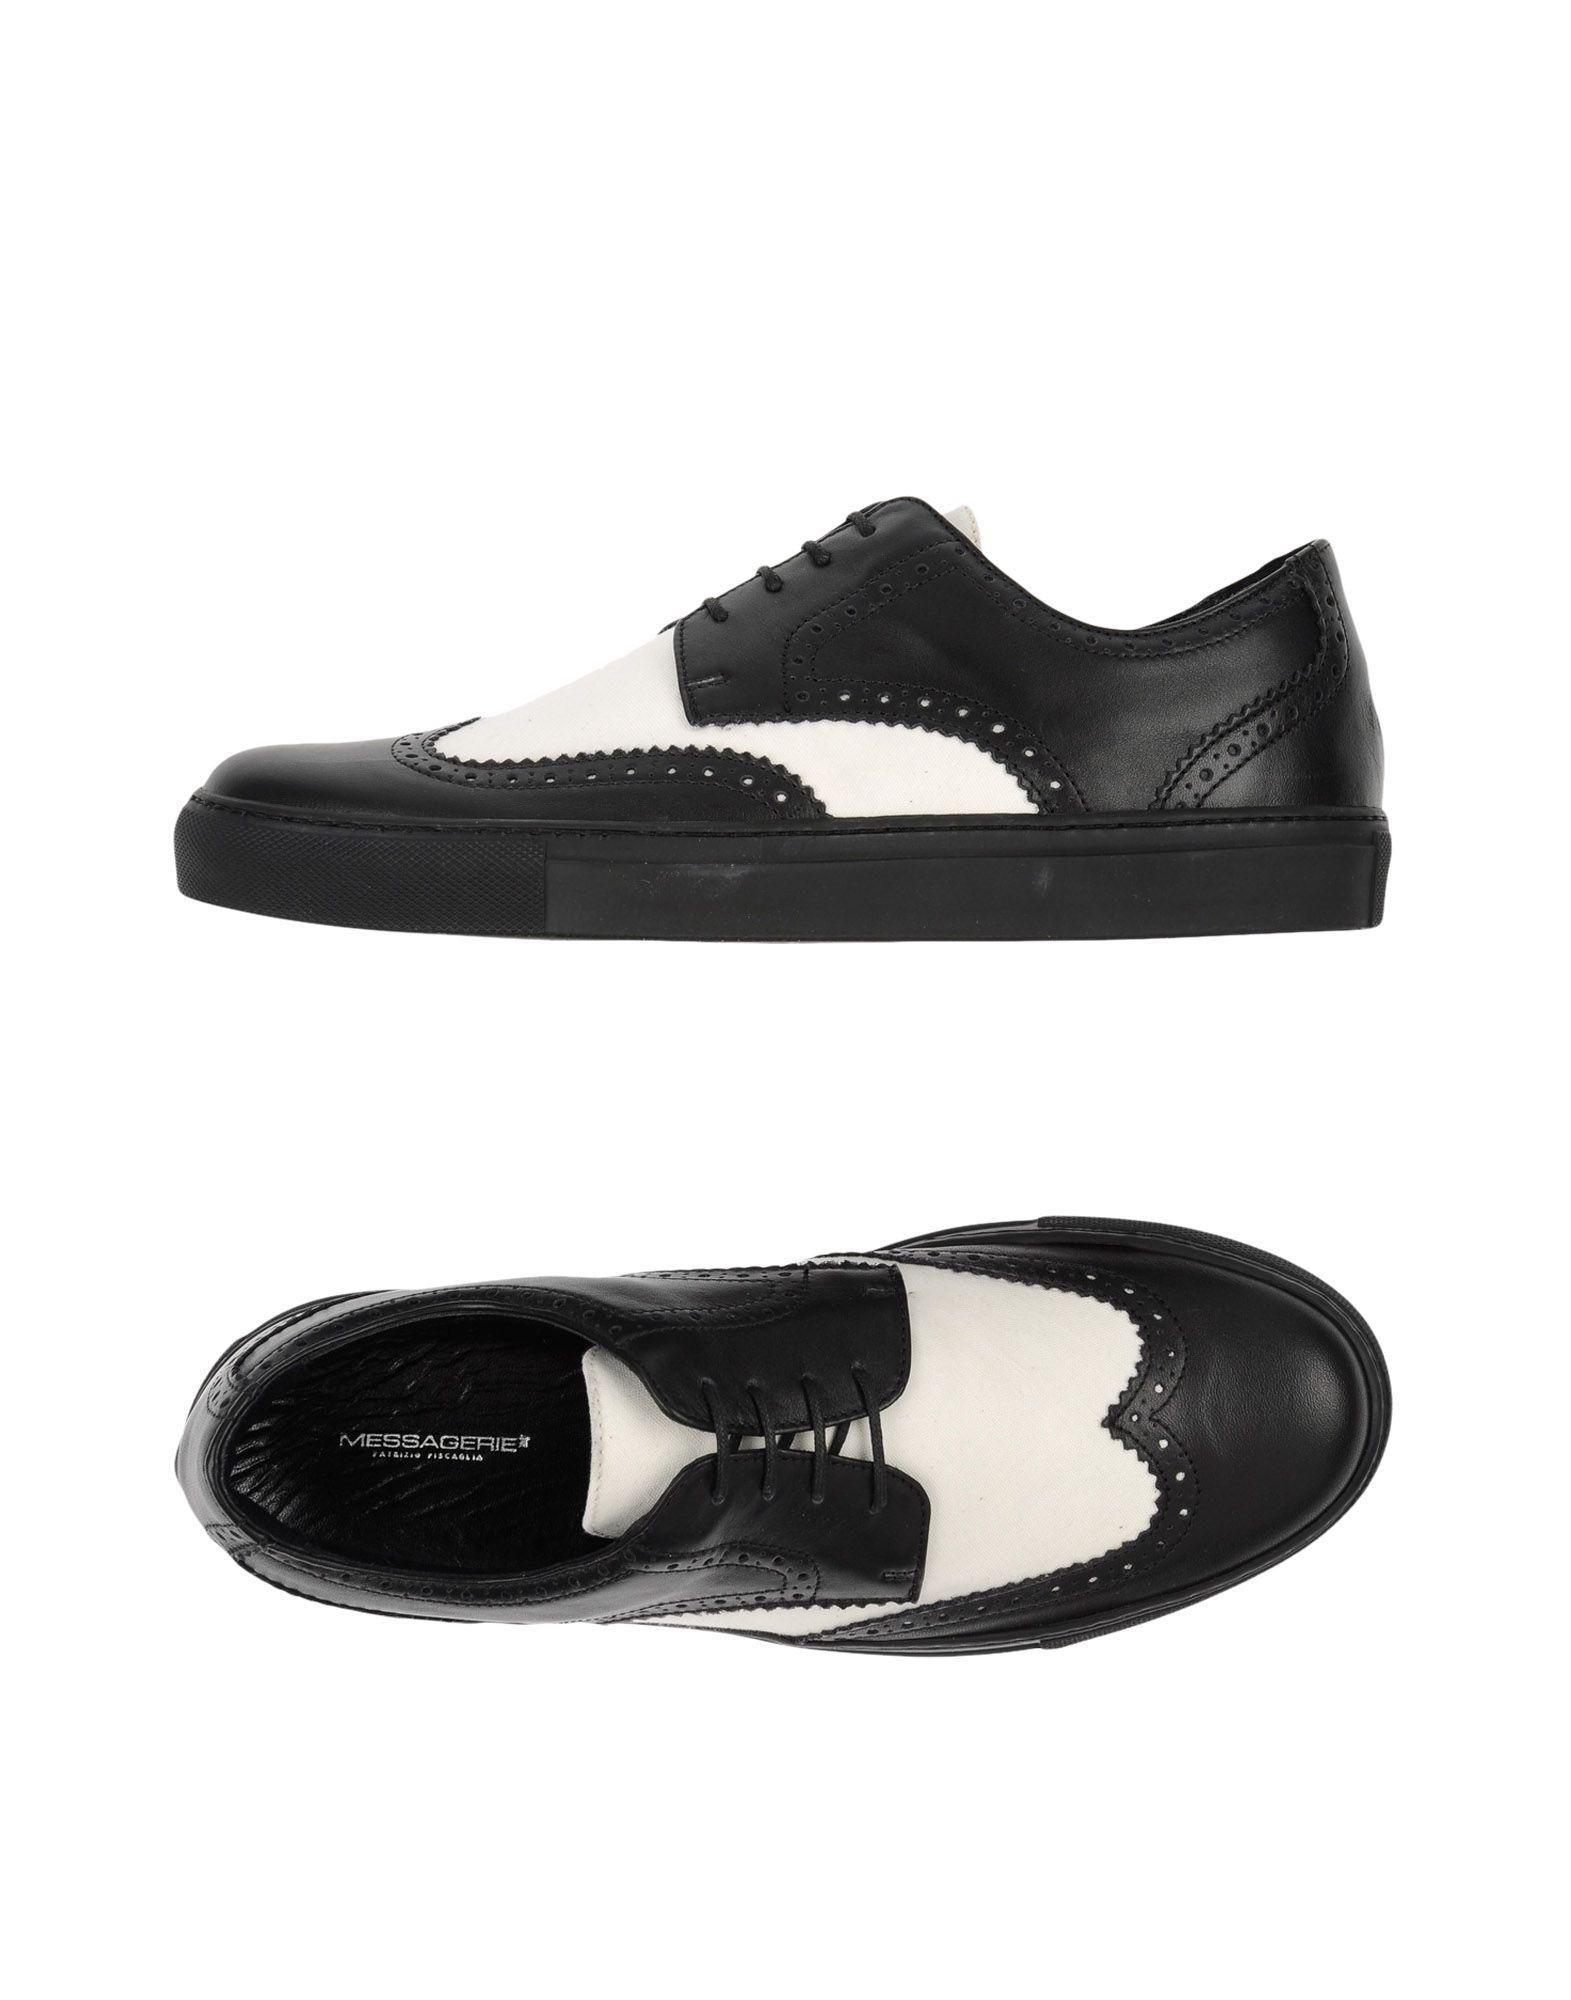 Messagerie Schnürschuhe Herren  44974074FS Gute Qualität beliebte Schuhe